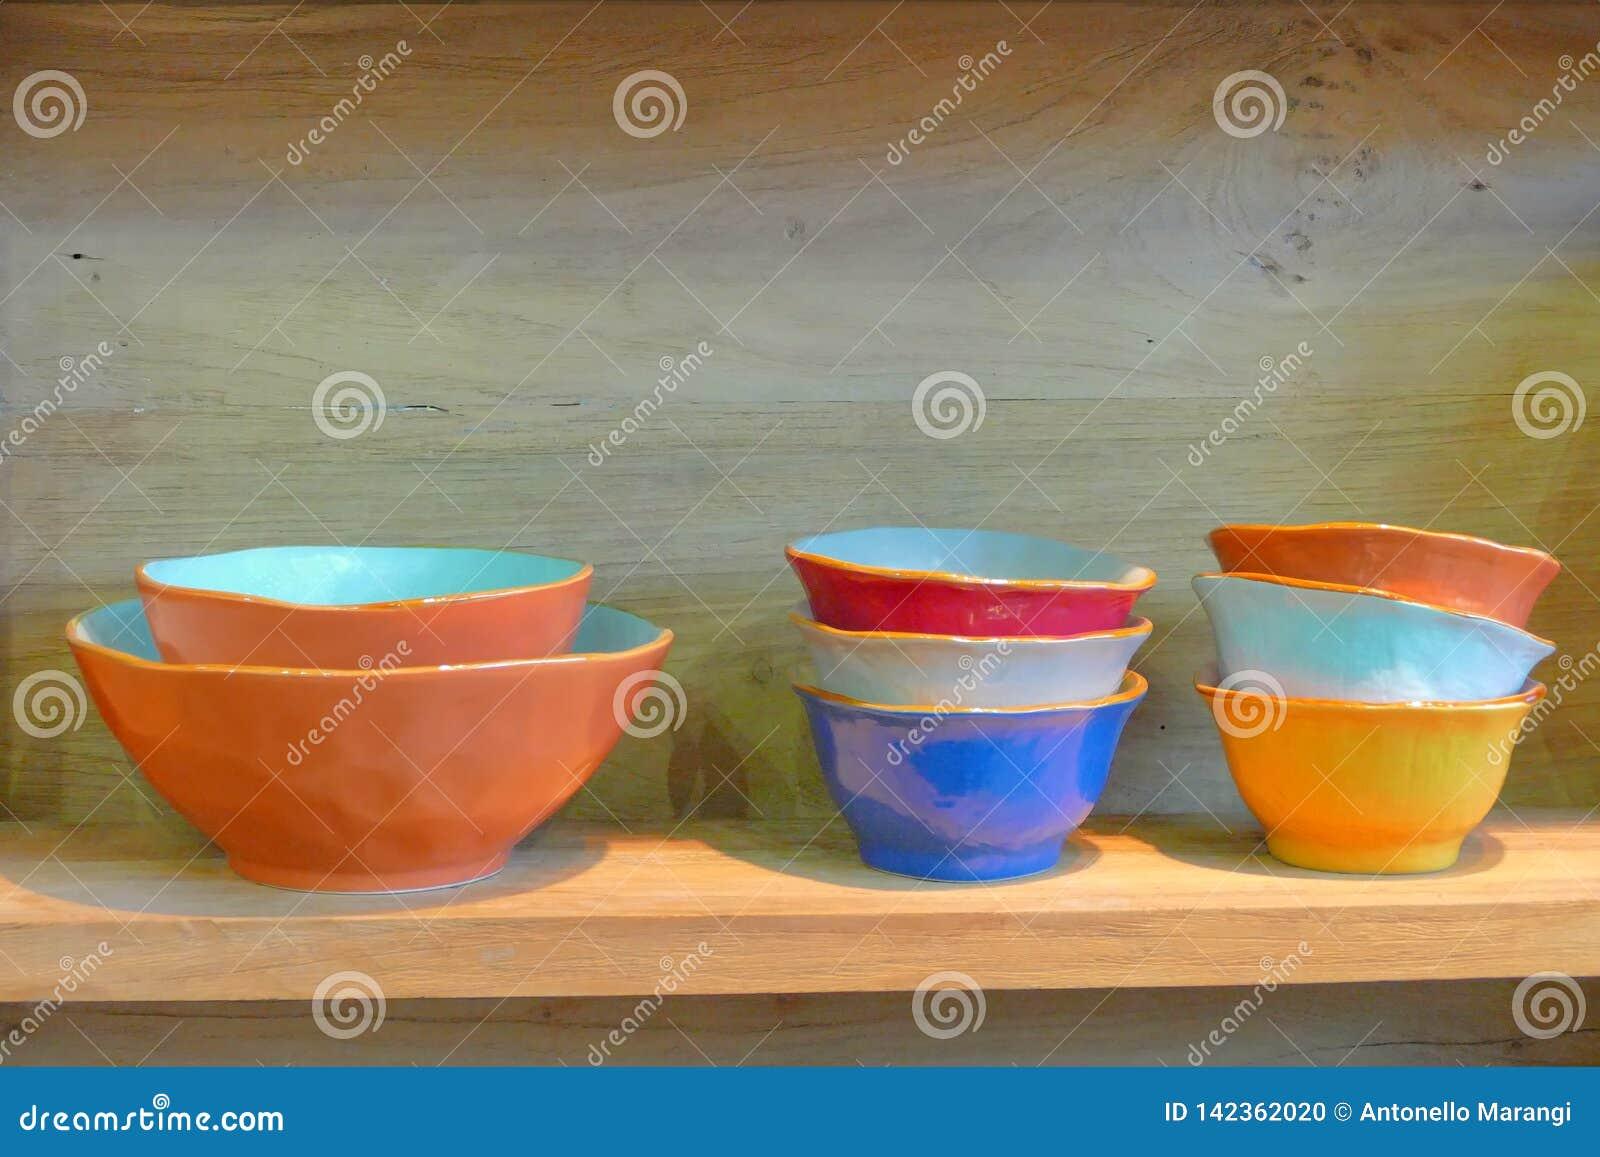 Fin Mediterraneenne De Vaisselle De Cuisine De Style Vers Le